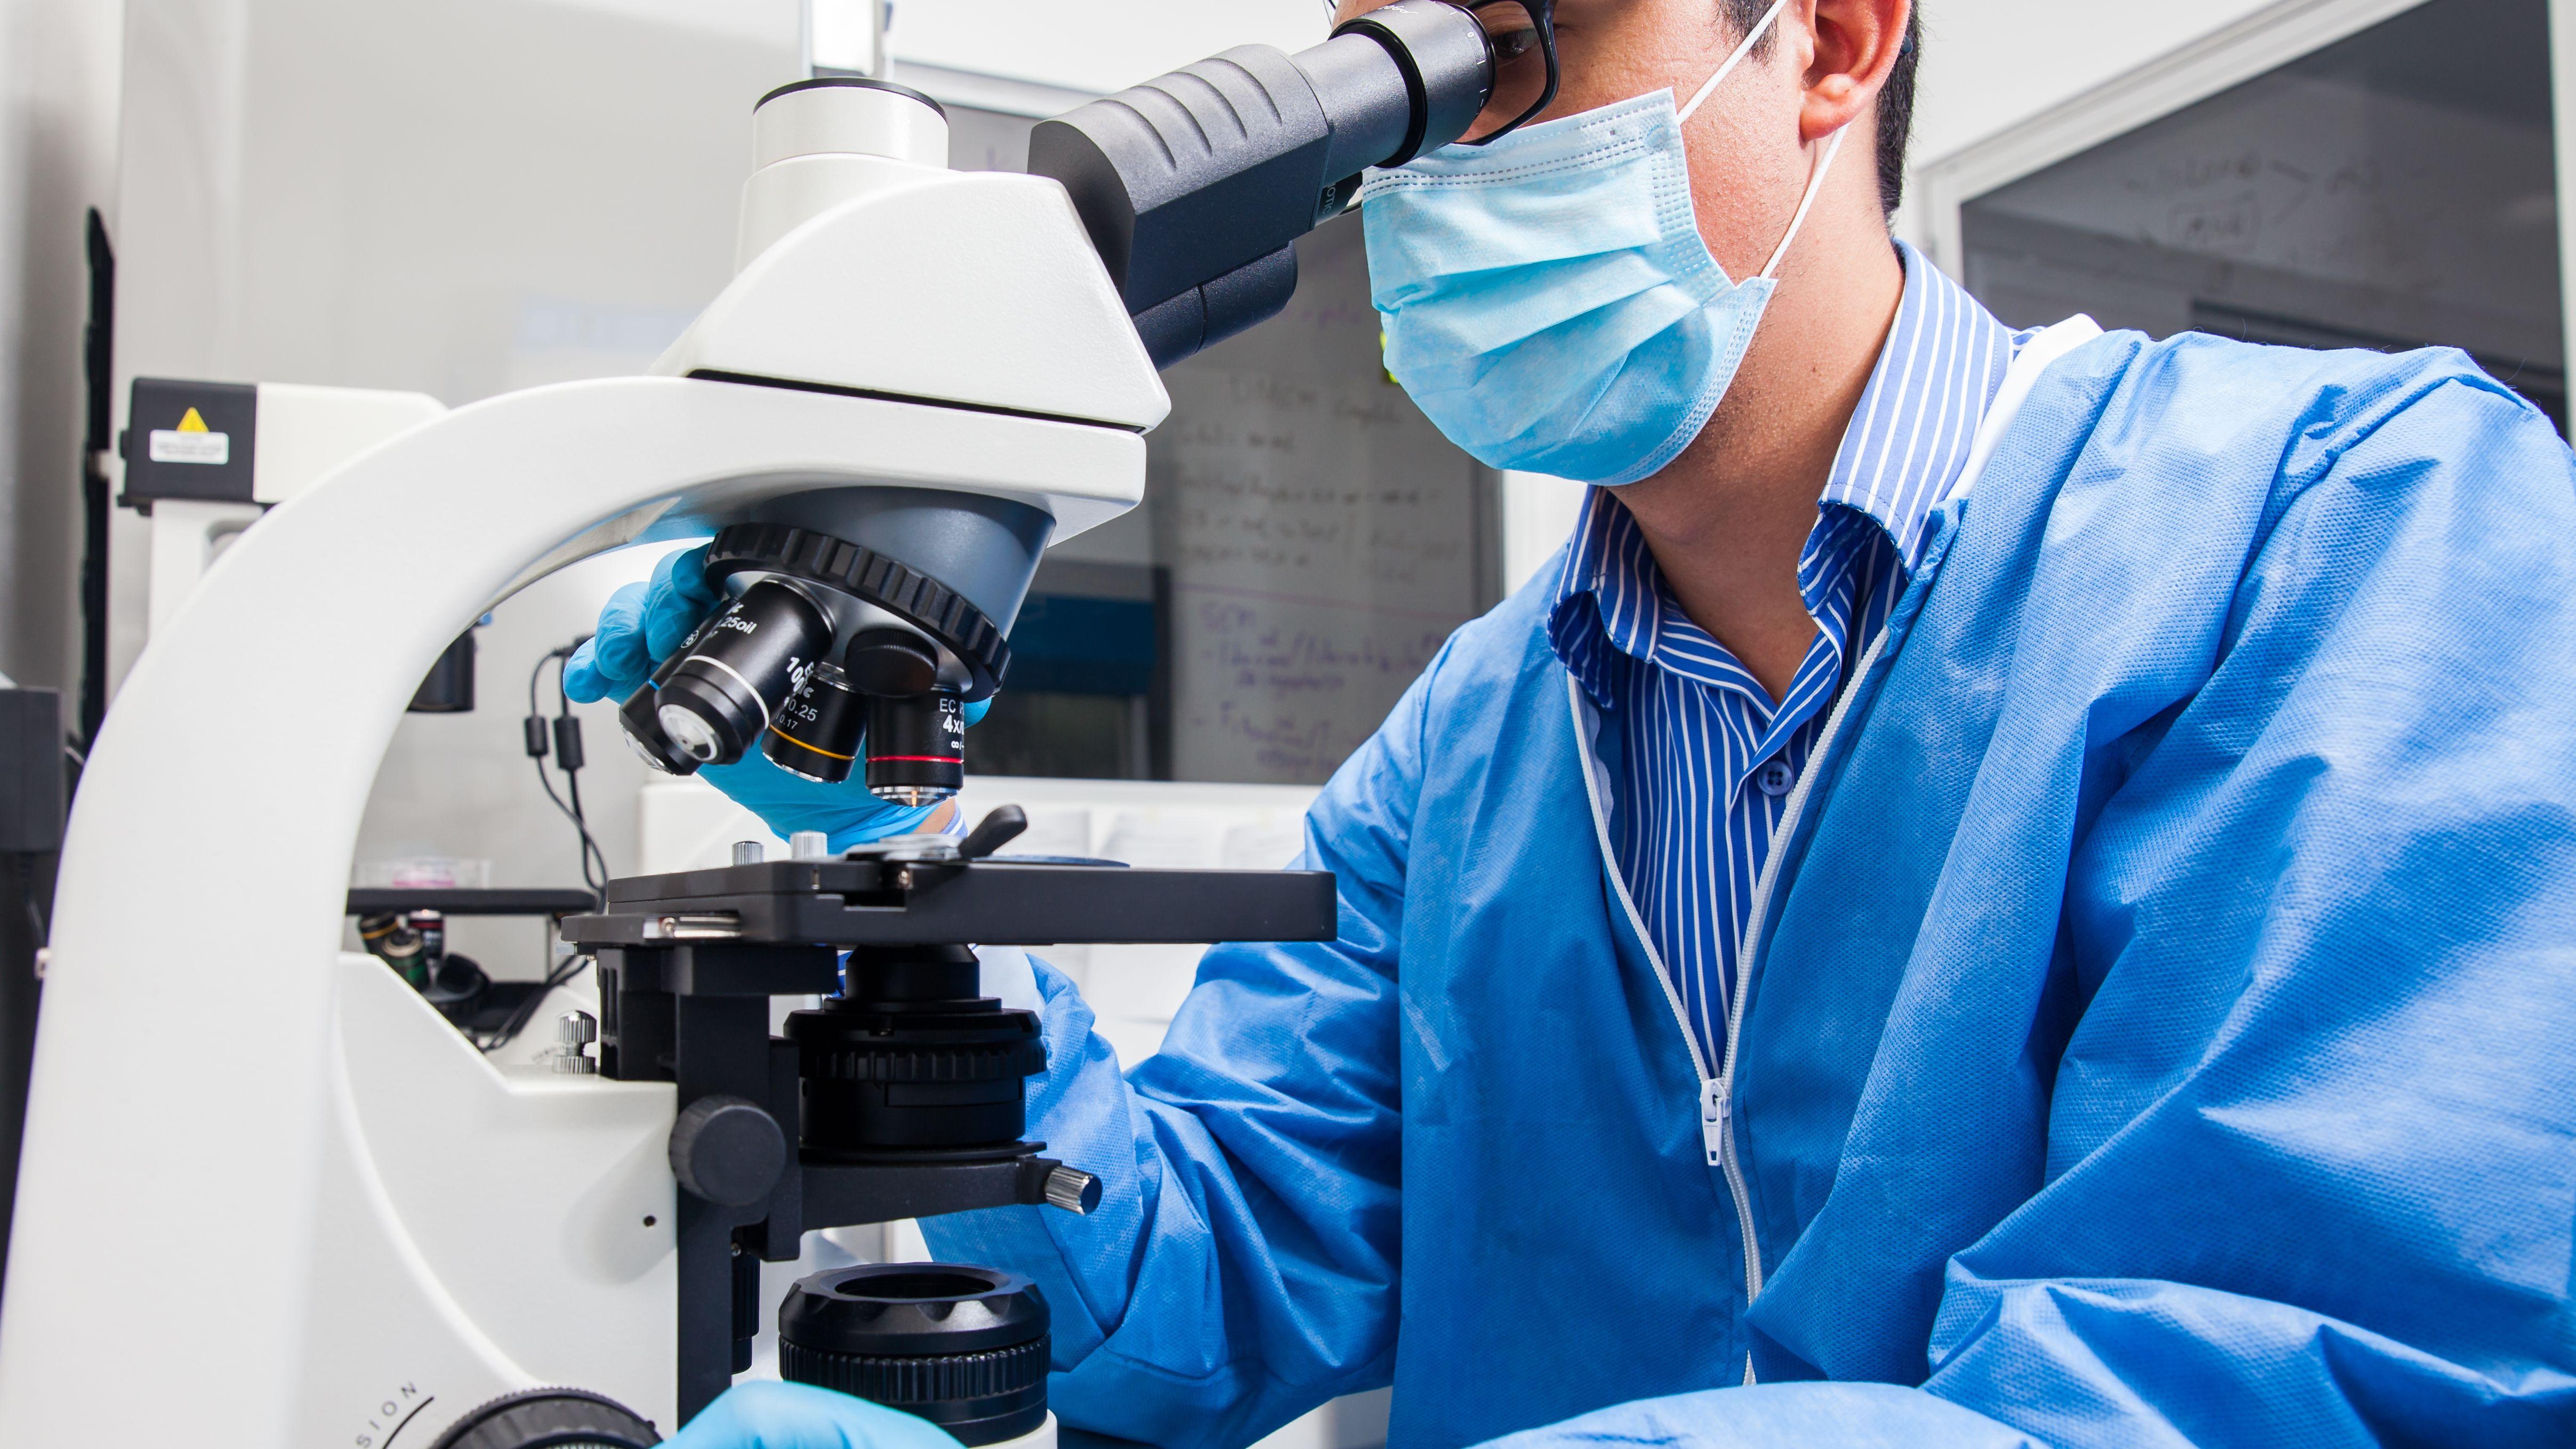 Untersuchung im Labor (Symbolbild)